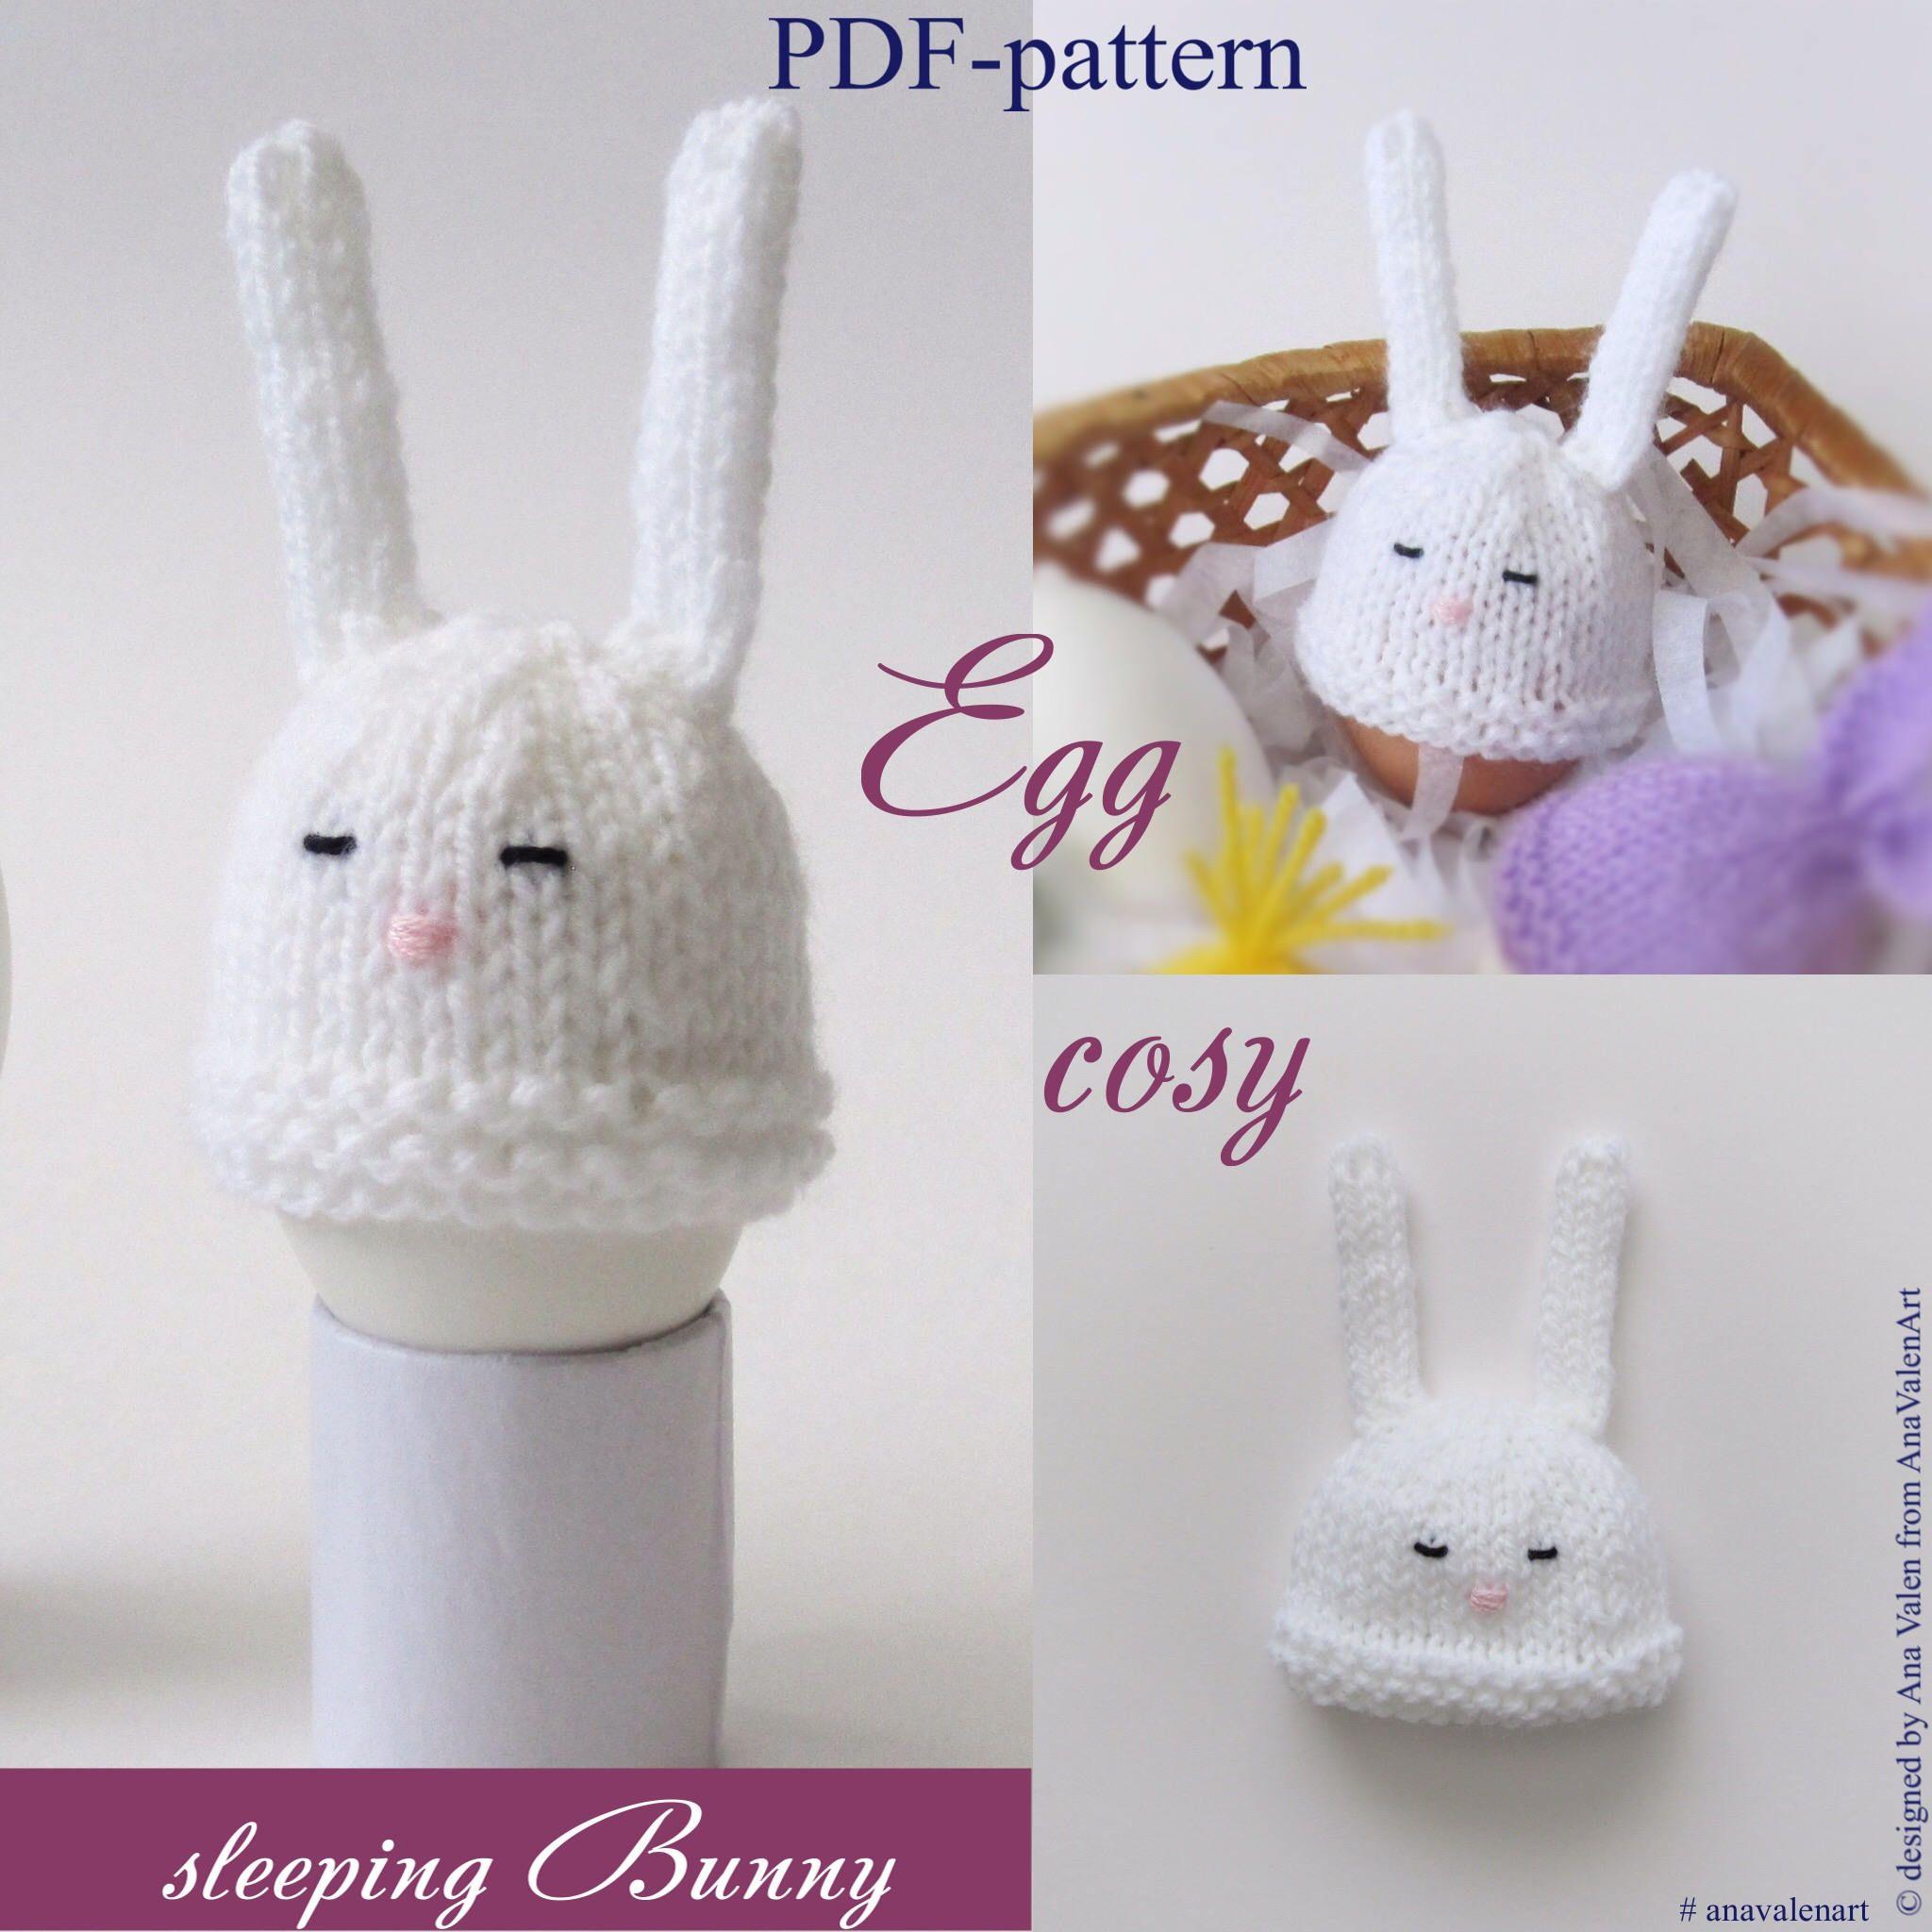 Knitting Pattern Egg cosy PDF-pattern Easter ornament Egg cozy PDF ...